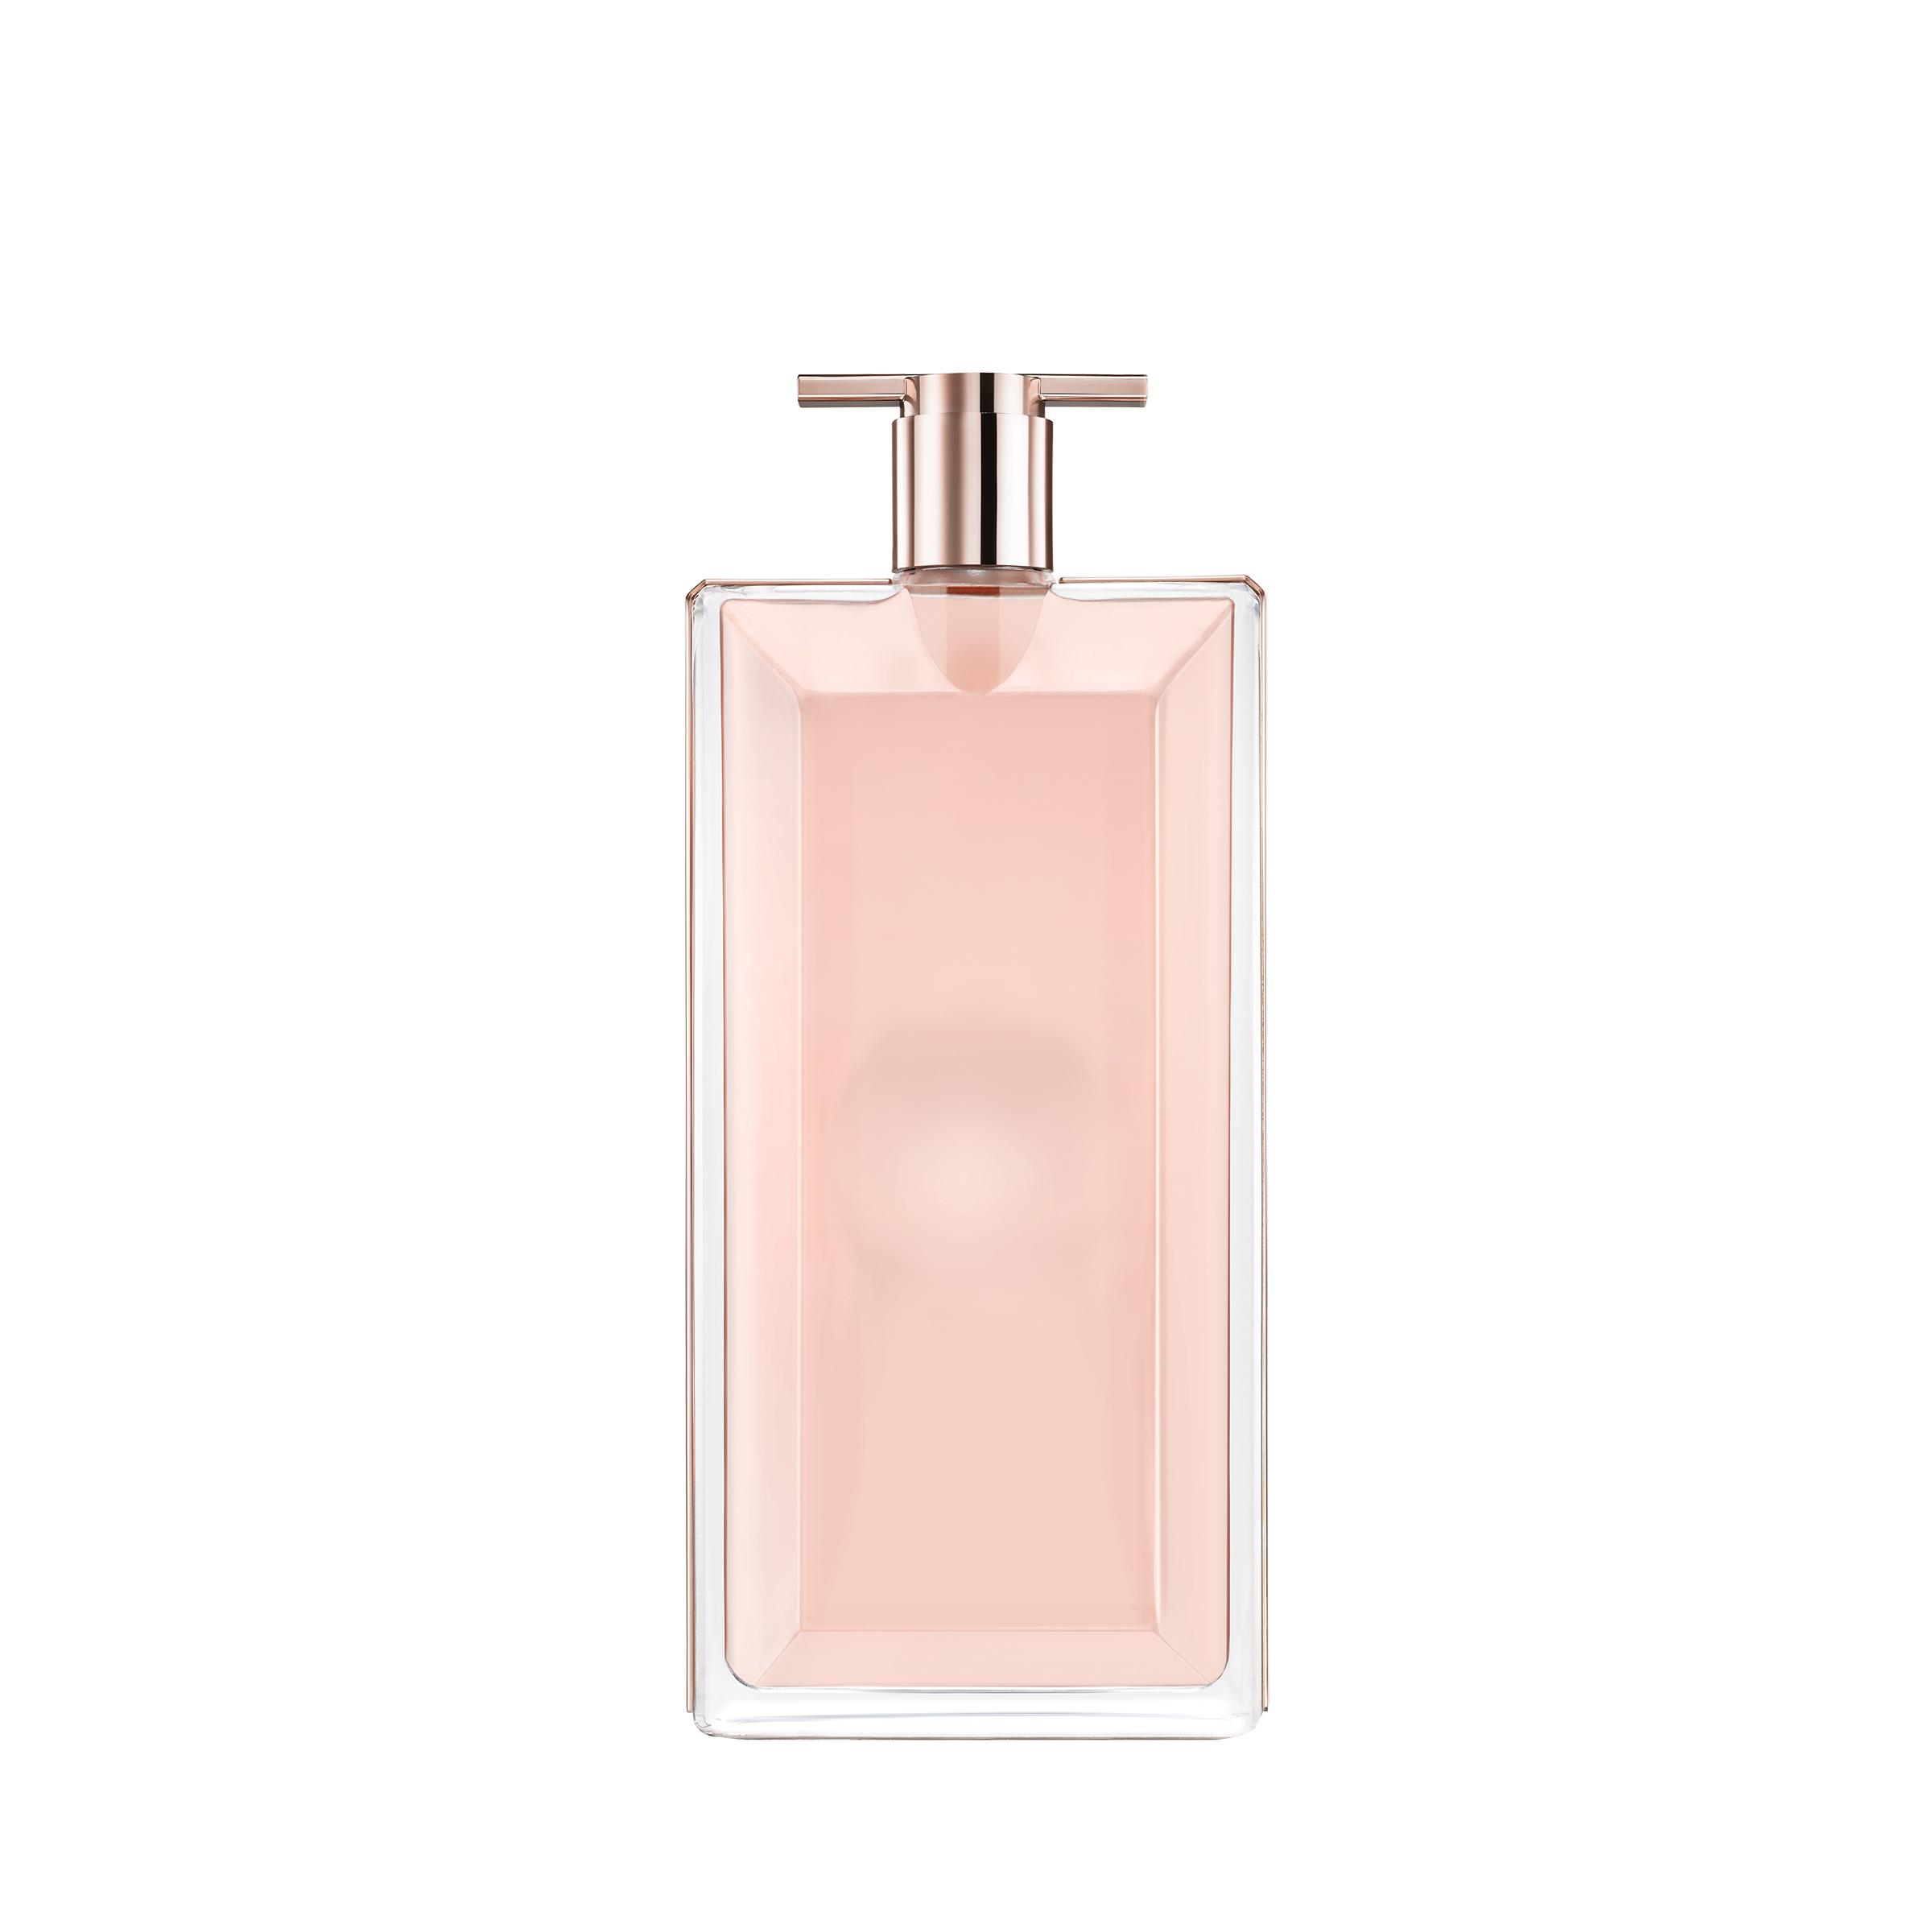 Idôle the new feminine fragrance by Lancôme Lancôme predstavlja Idôle, ženstveni miris za novu generaciju